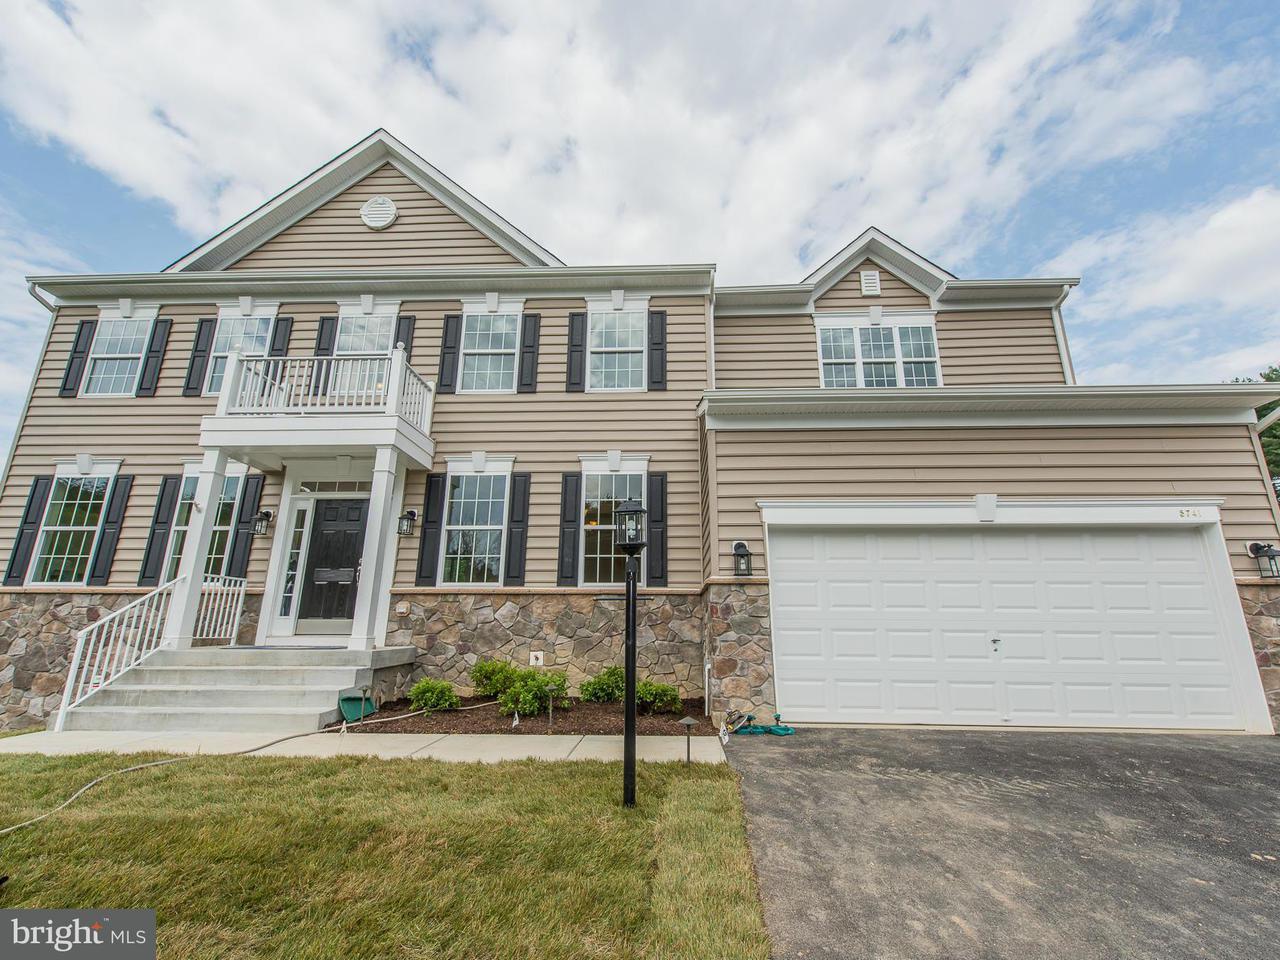 Single Family Home for Sale at 5741 LANDING Road 5741 LANDING Road Elkridge, Maryland 21075 United States